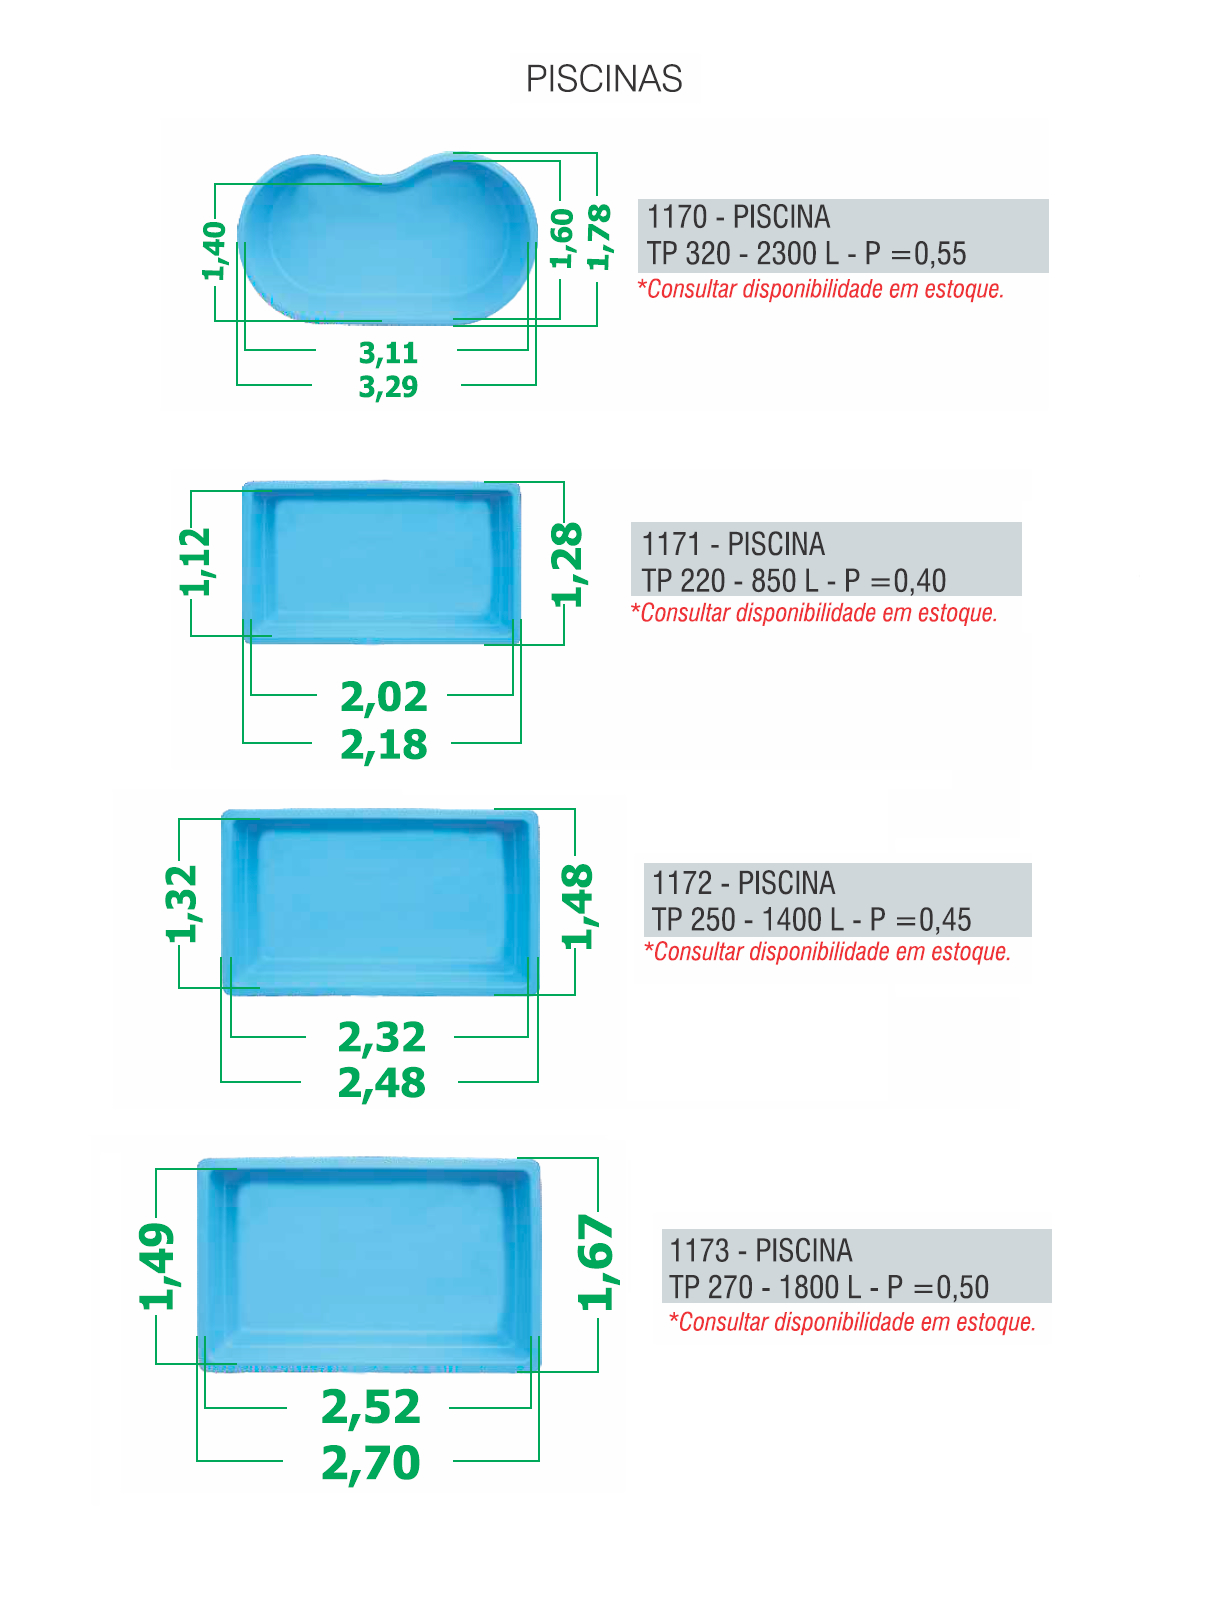 Piscinas pequenas modelos e estilos for Piscinas de fibra pequenas precios